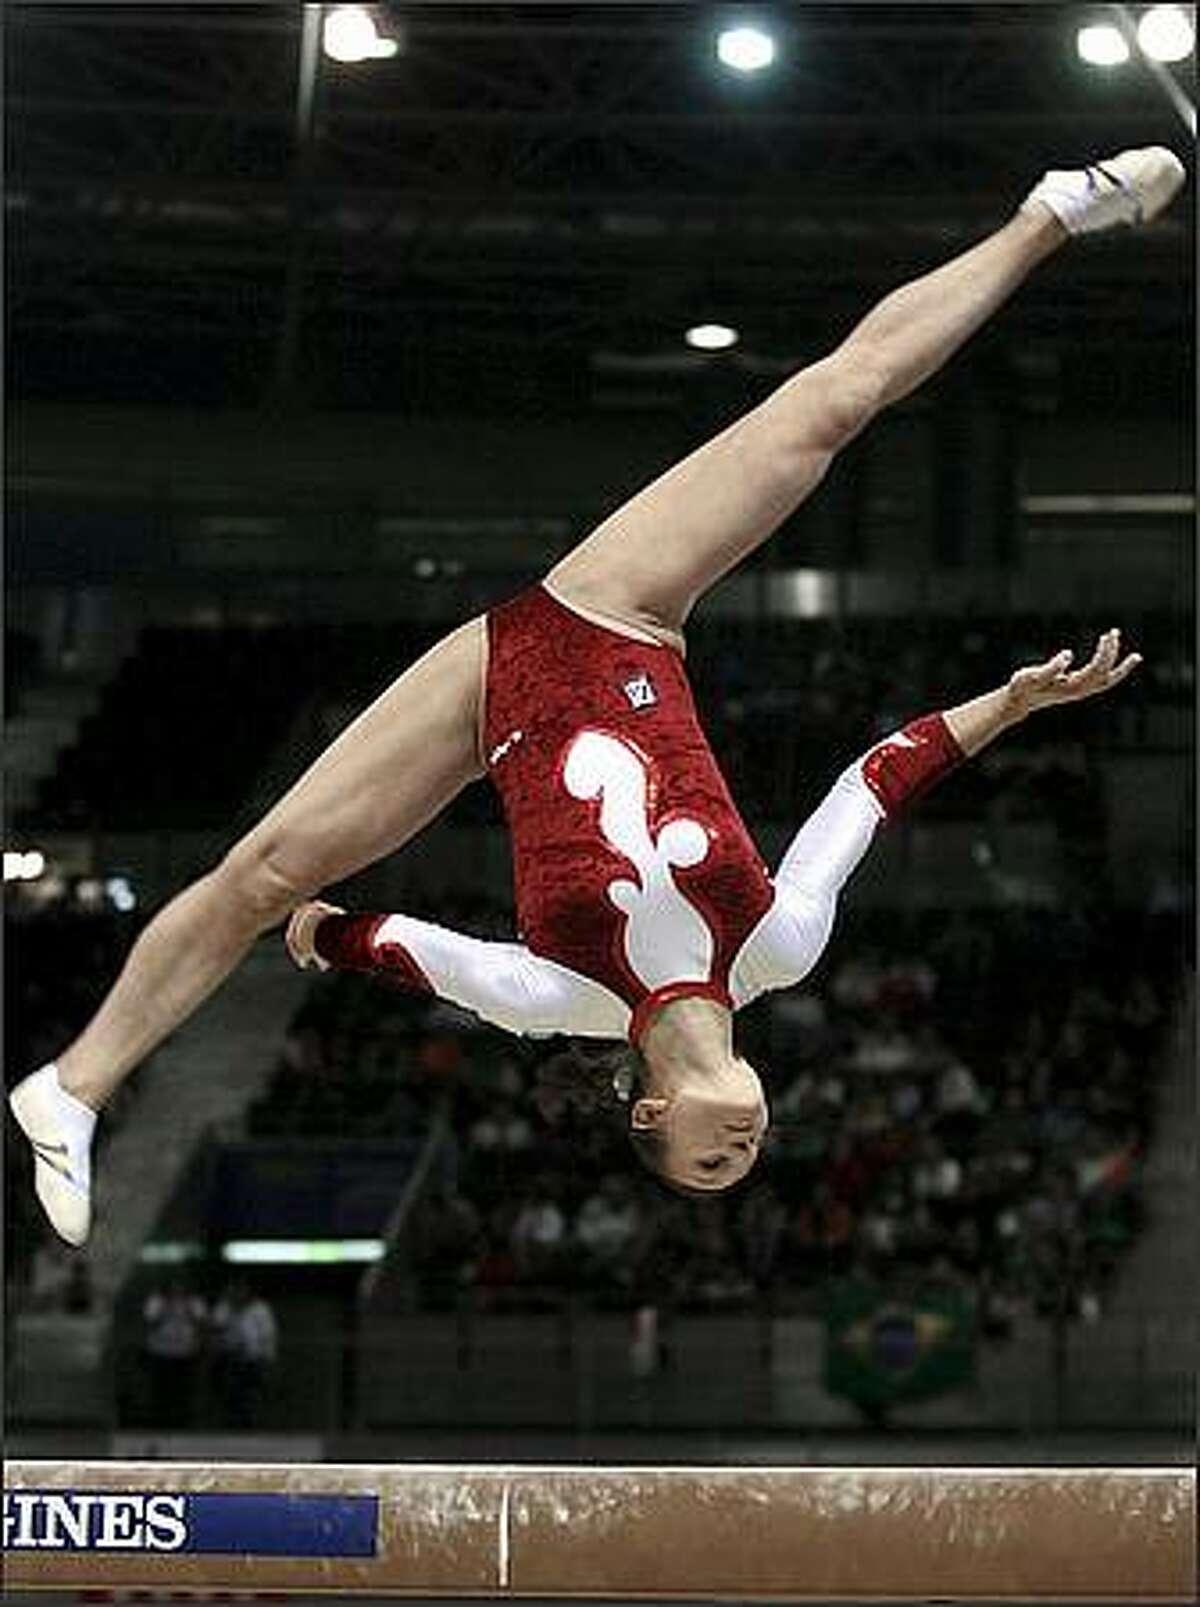 Dariya Zgoba of the Ukraine jumps during the Artistic Gymnastics World Cup Finals in Madrid. (AP Photo/EFE, Victor lerena)